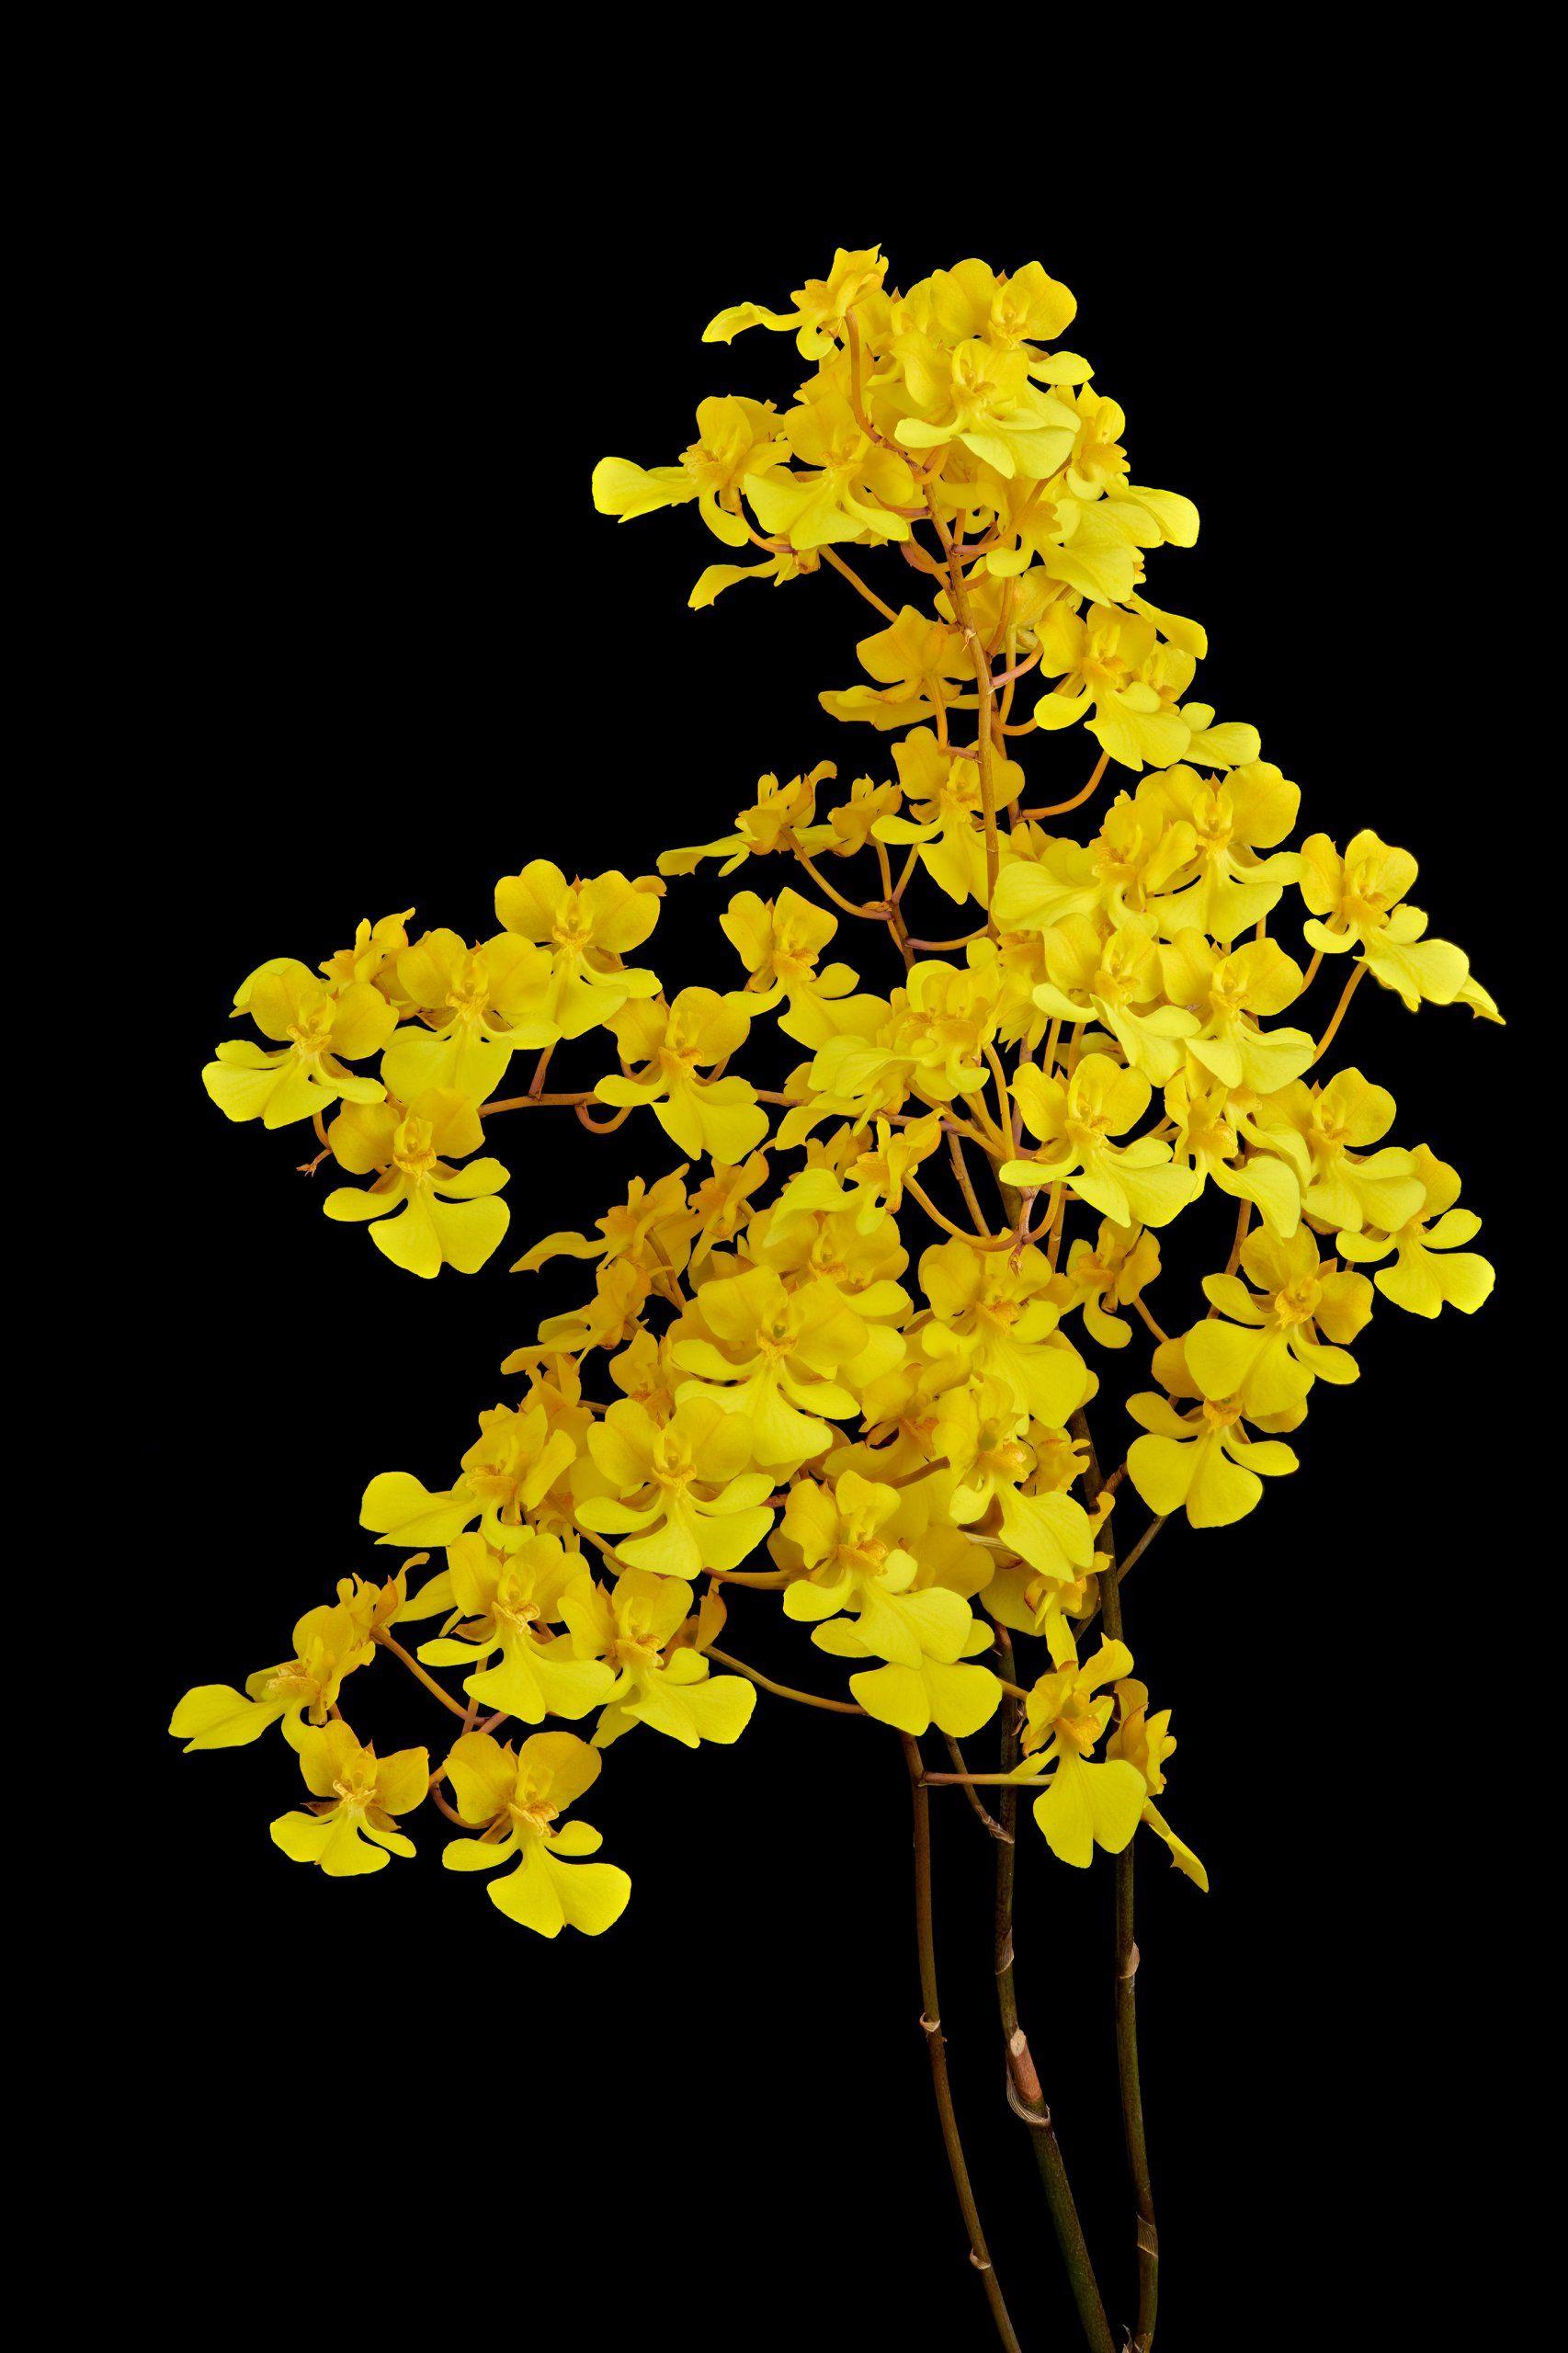 Oncidium Onustum Oncidium Wild Orchid Beautiful Flowers